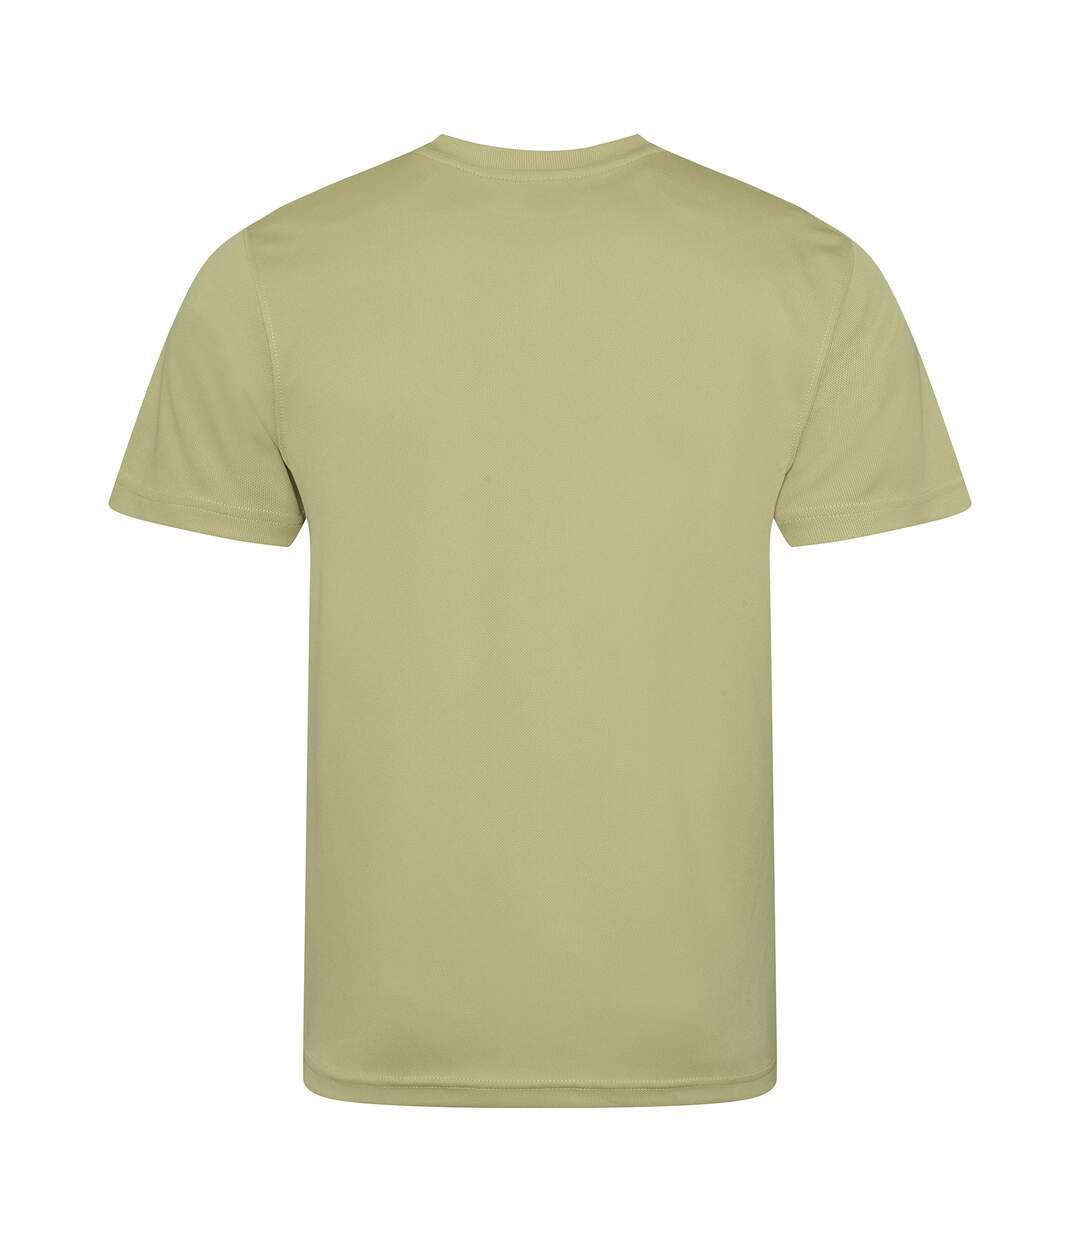 AWDis Just Cool Mens Performance Plain T-Shirt (Desert Sand) - UTRW683